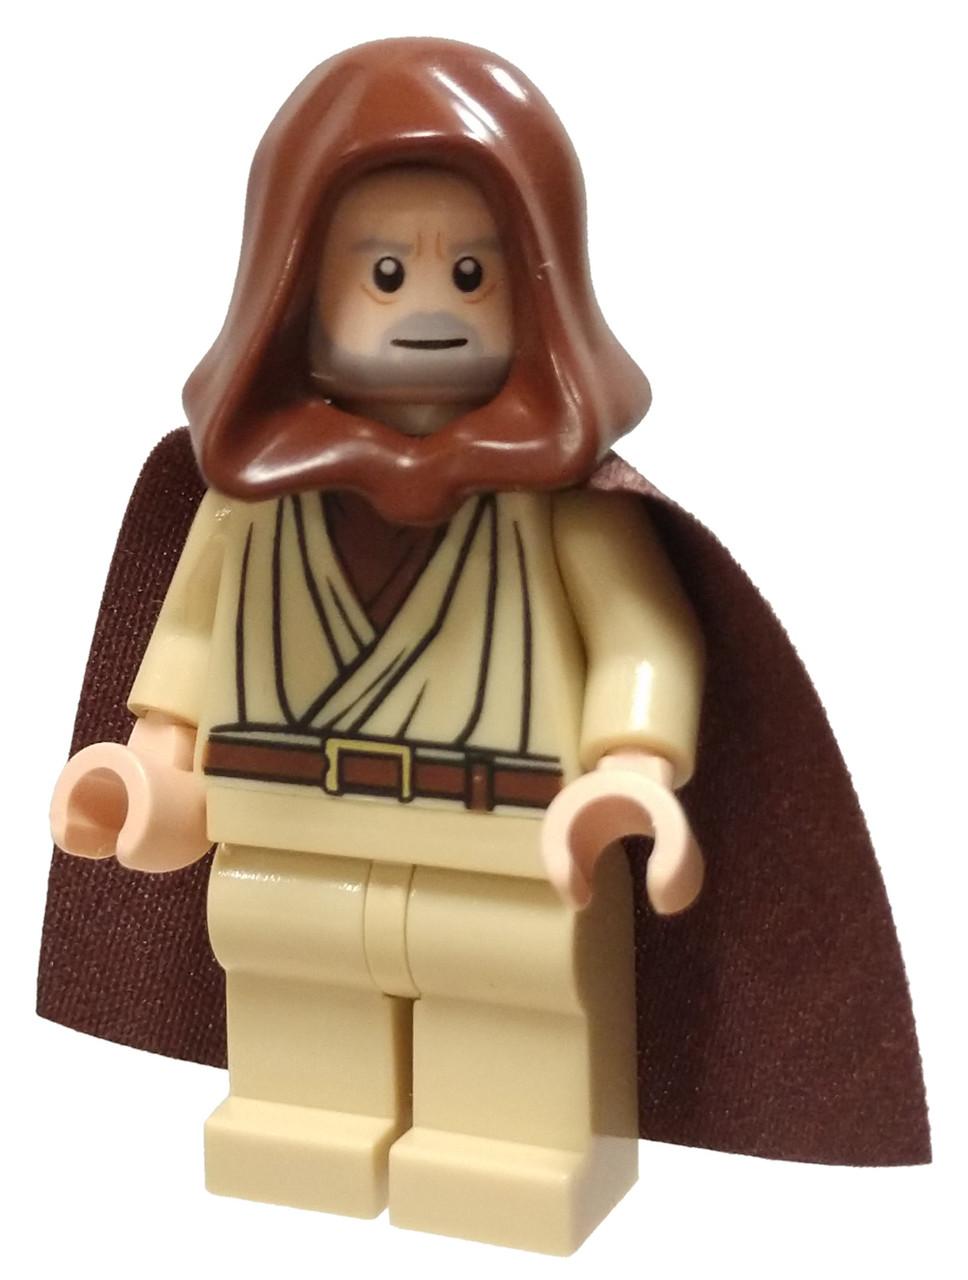 Lego Star Wars Obi Wan Icon : Obi-Wan, Kenobi, Minifigure, Loose, ToyWiz